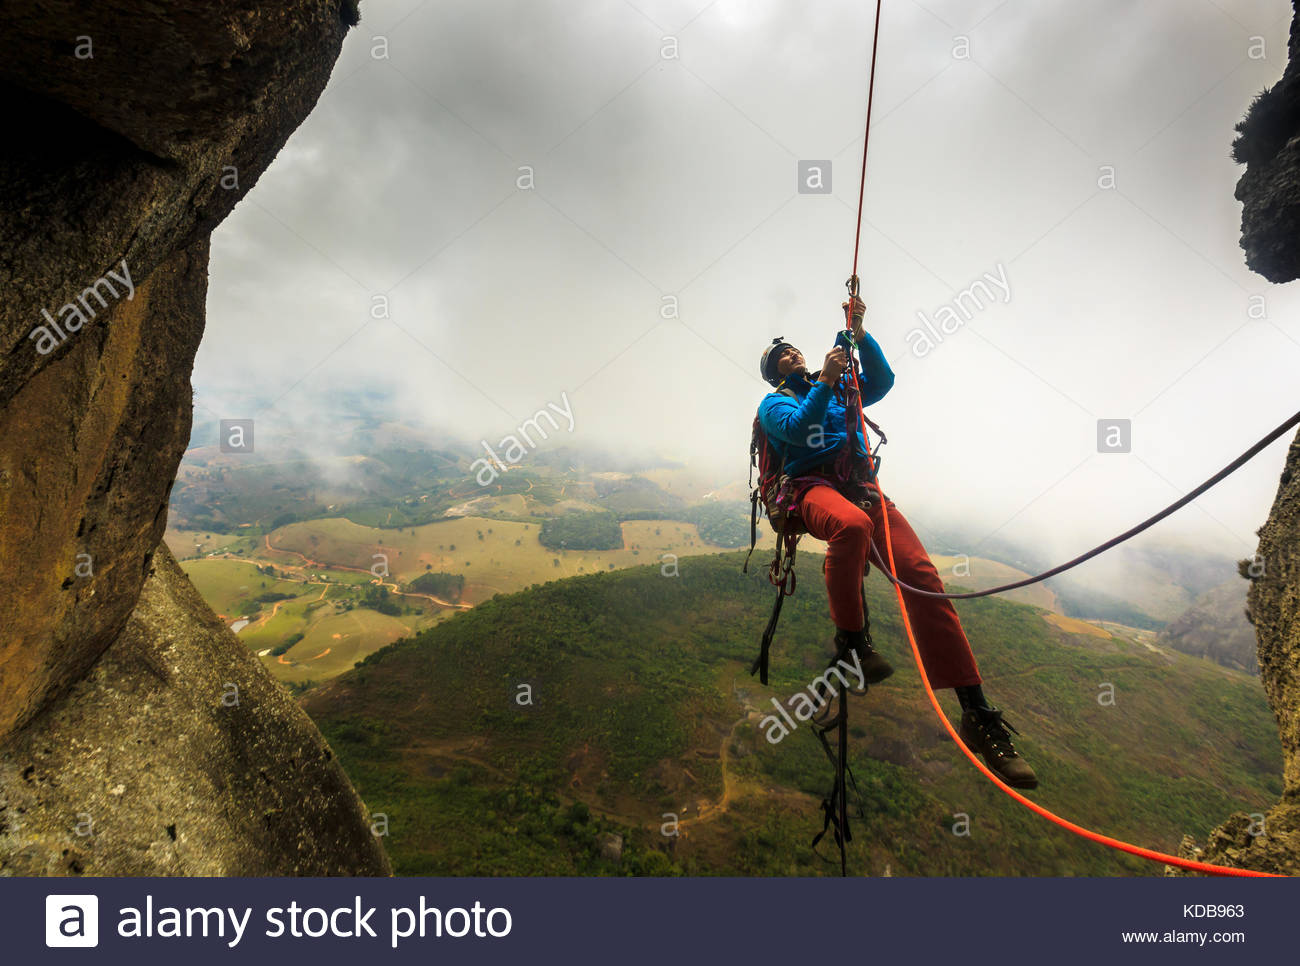 Male climber ascending in Brazilian mountain. - Stock Image